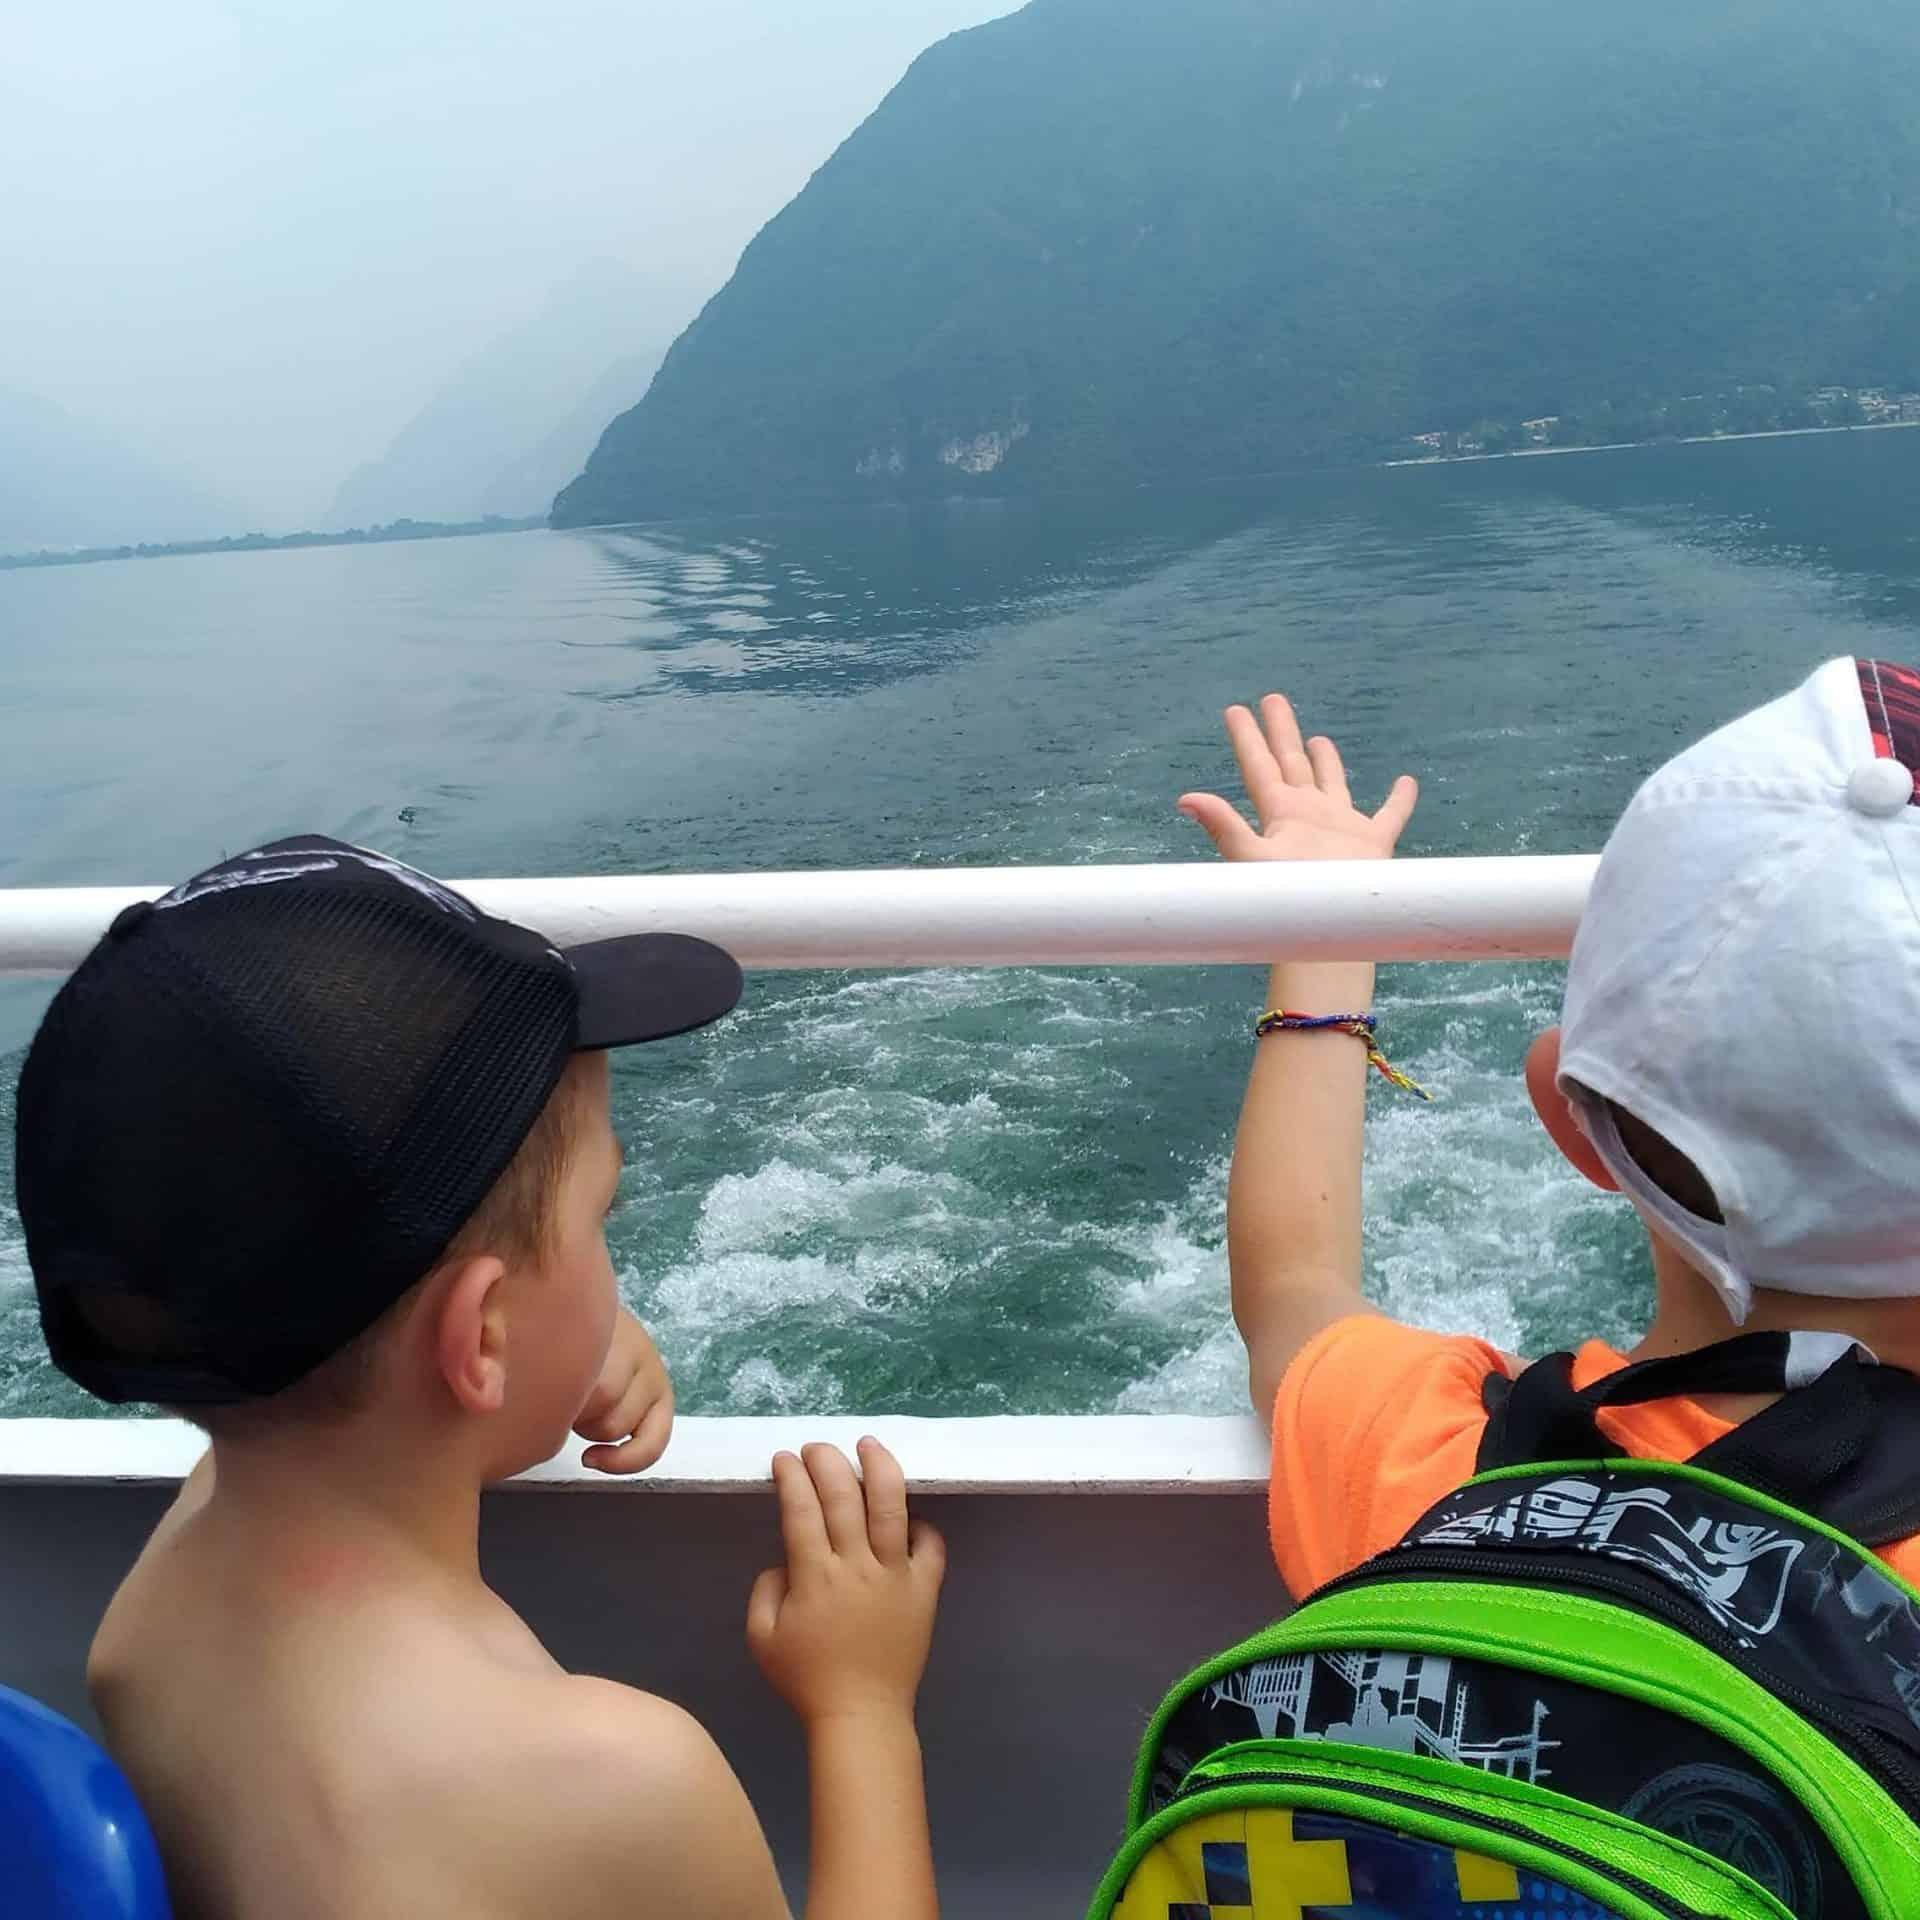 Dag 4. Boat tocht Idromeer